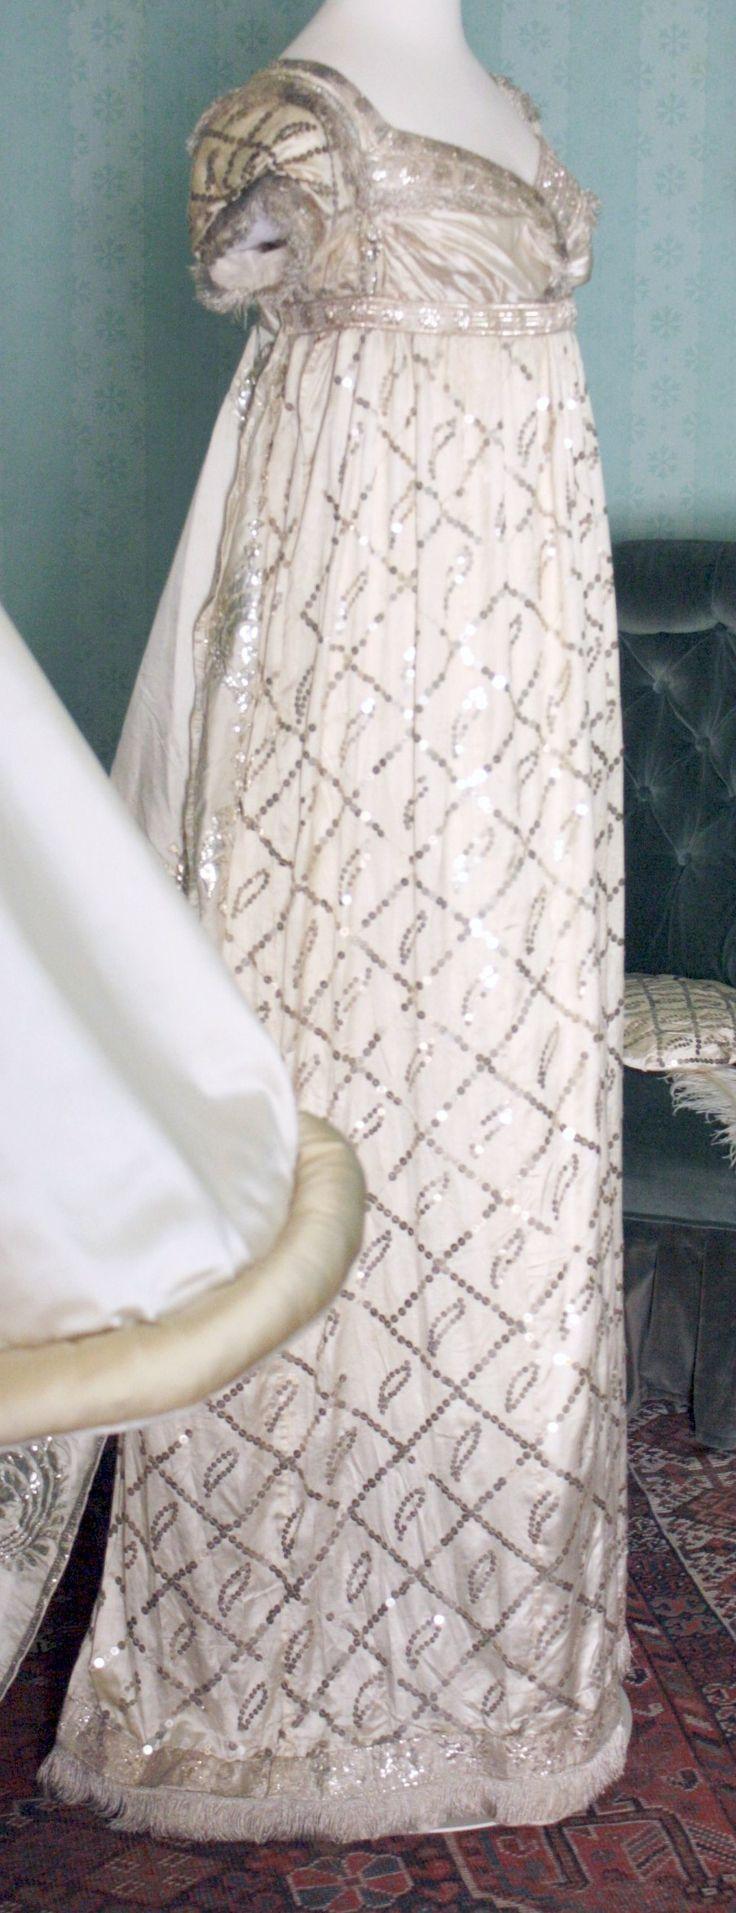 Regency gown at Saltram House